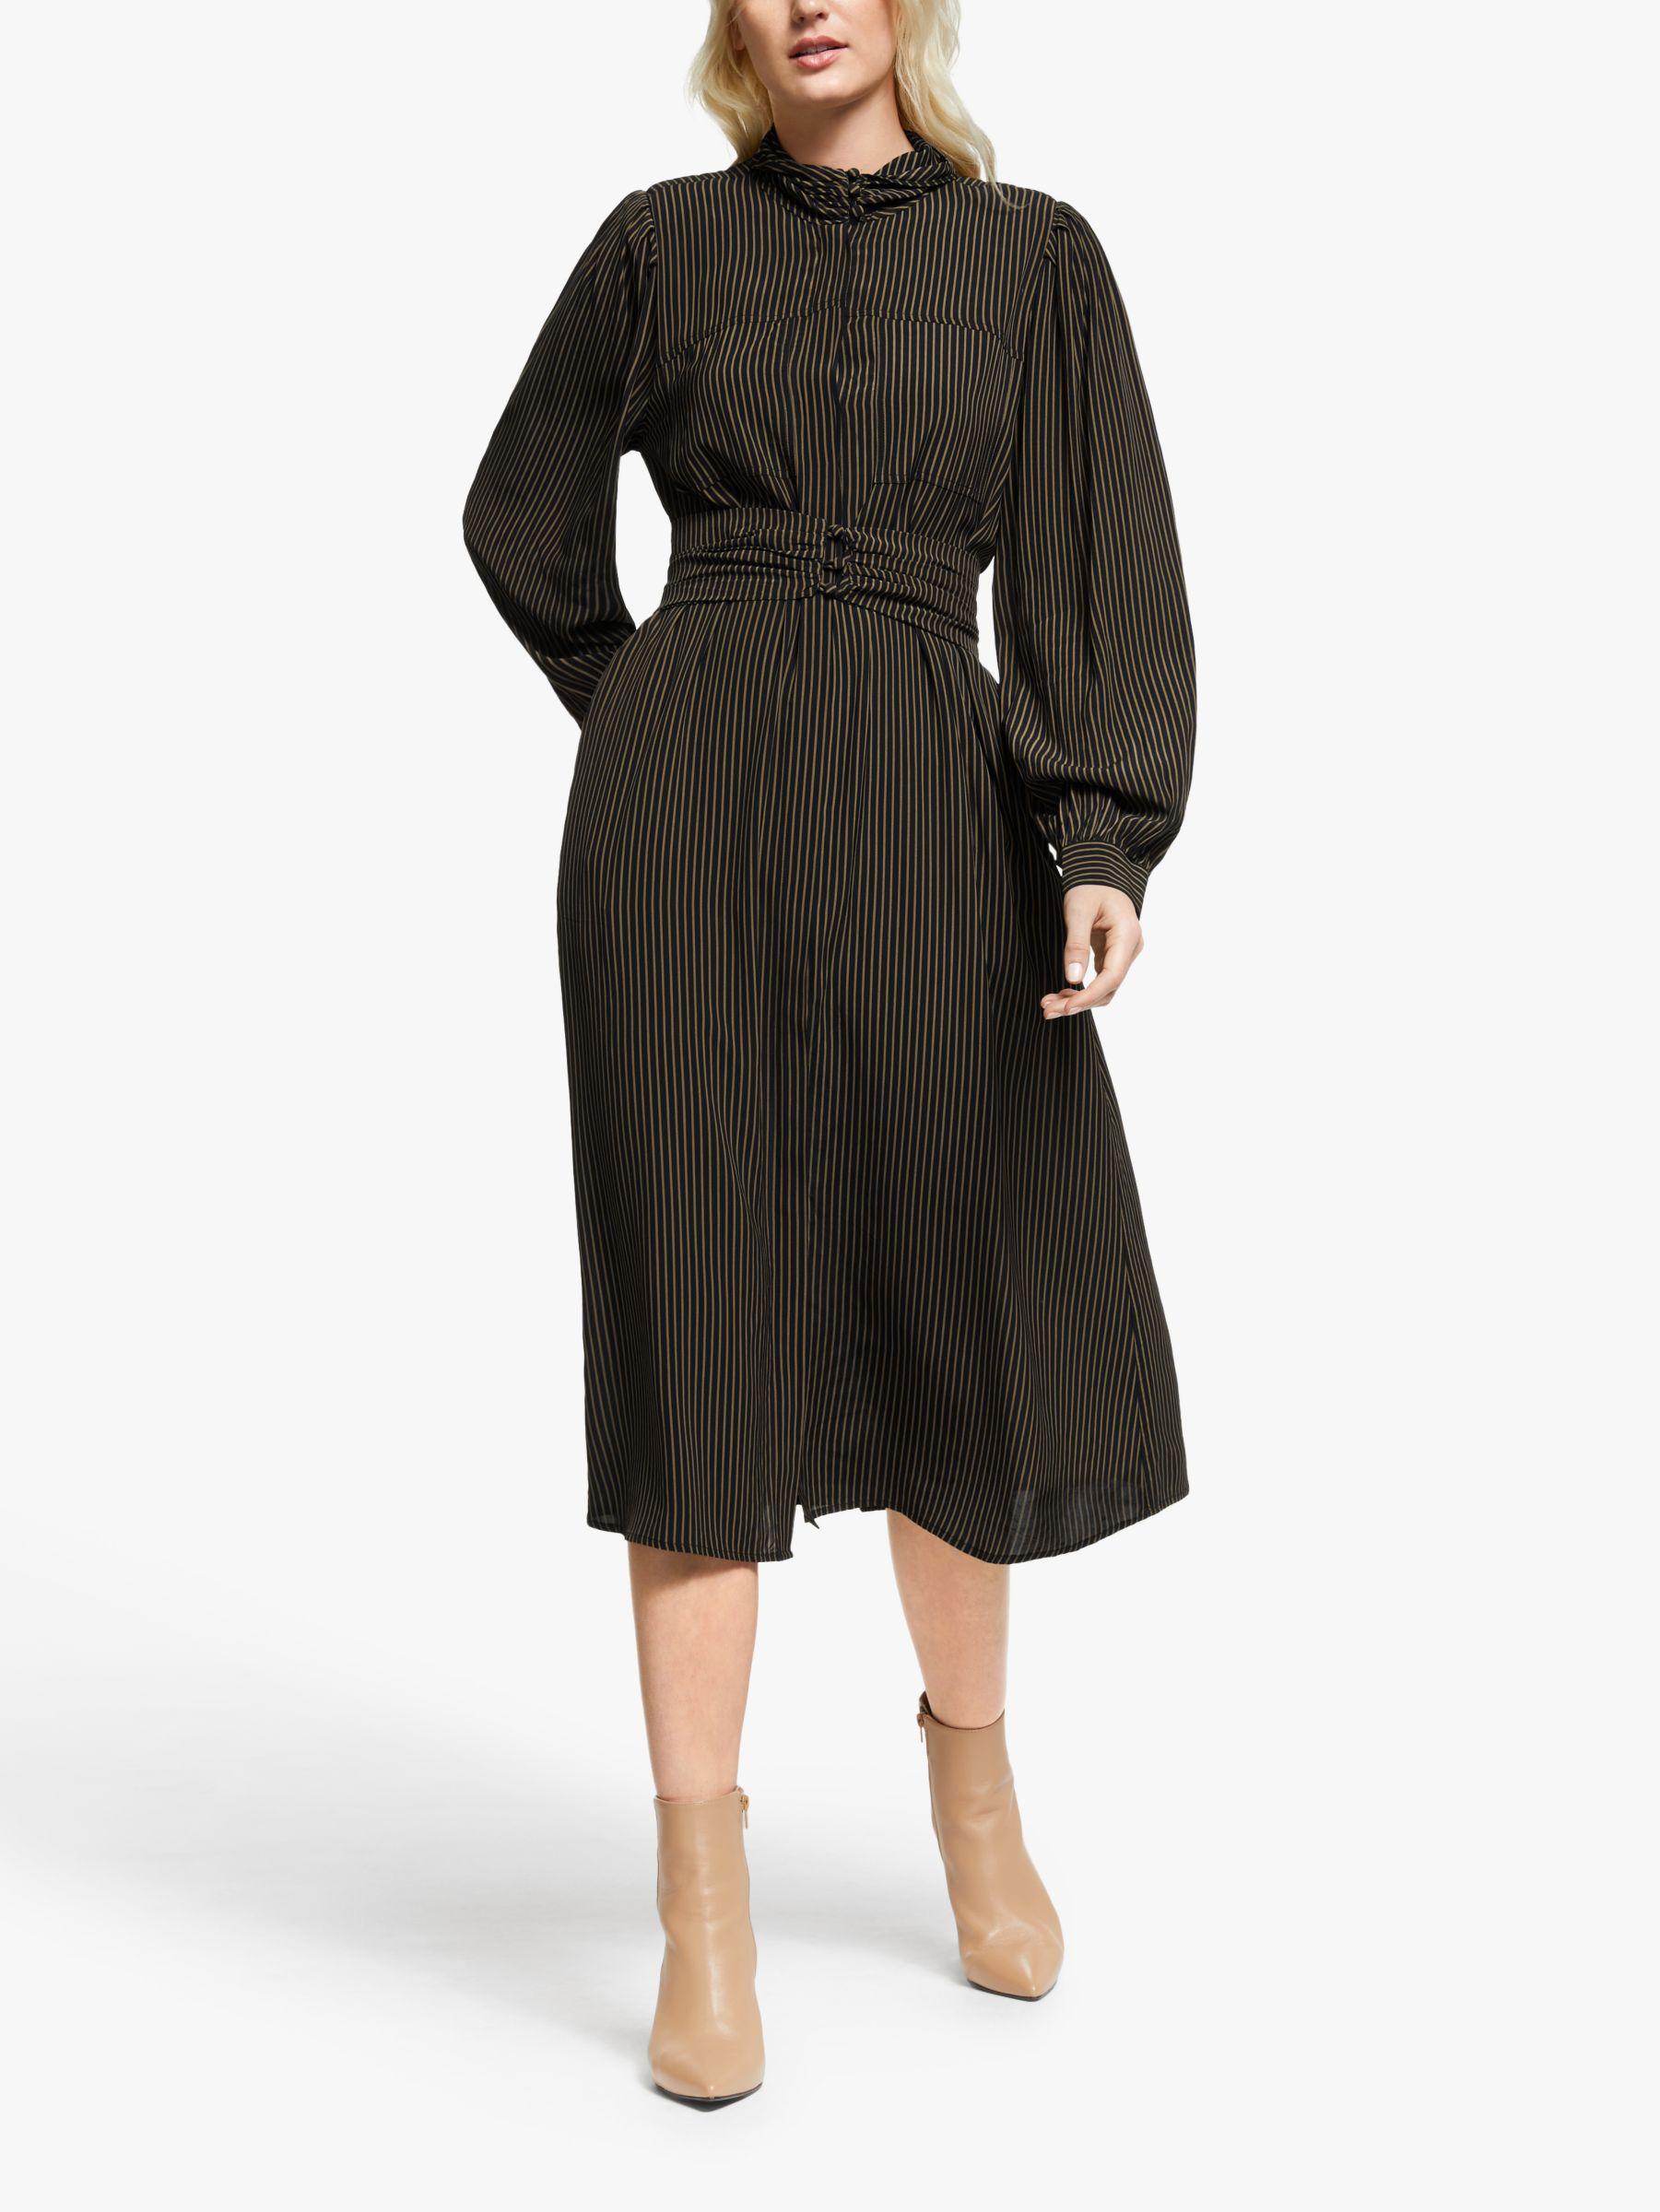 Gestuz Gestuz Levira Stripe Midi Dress, Black/Capers